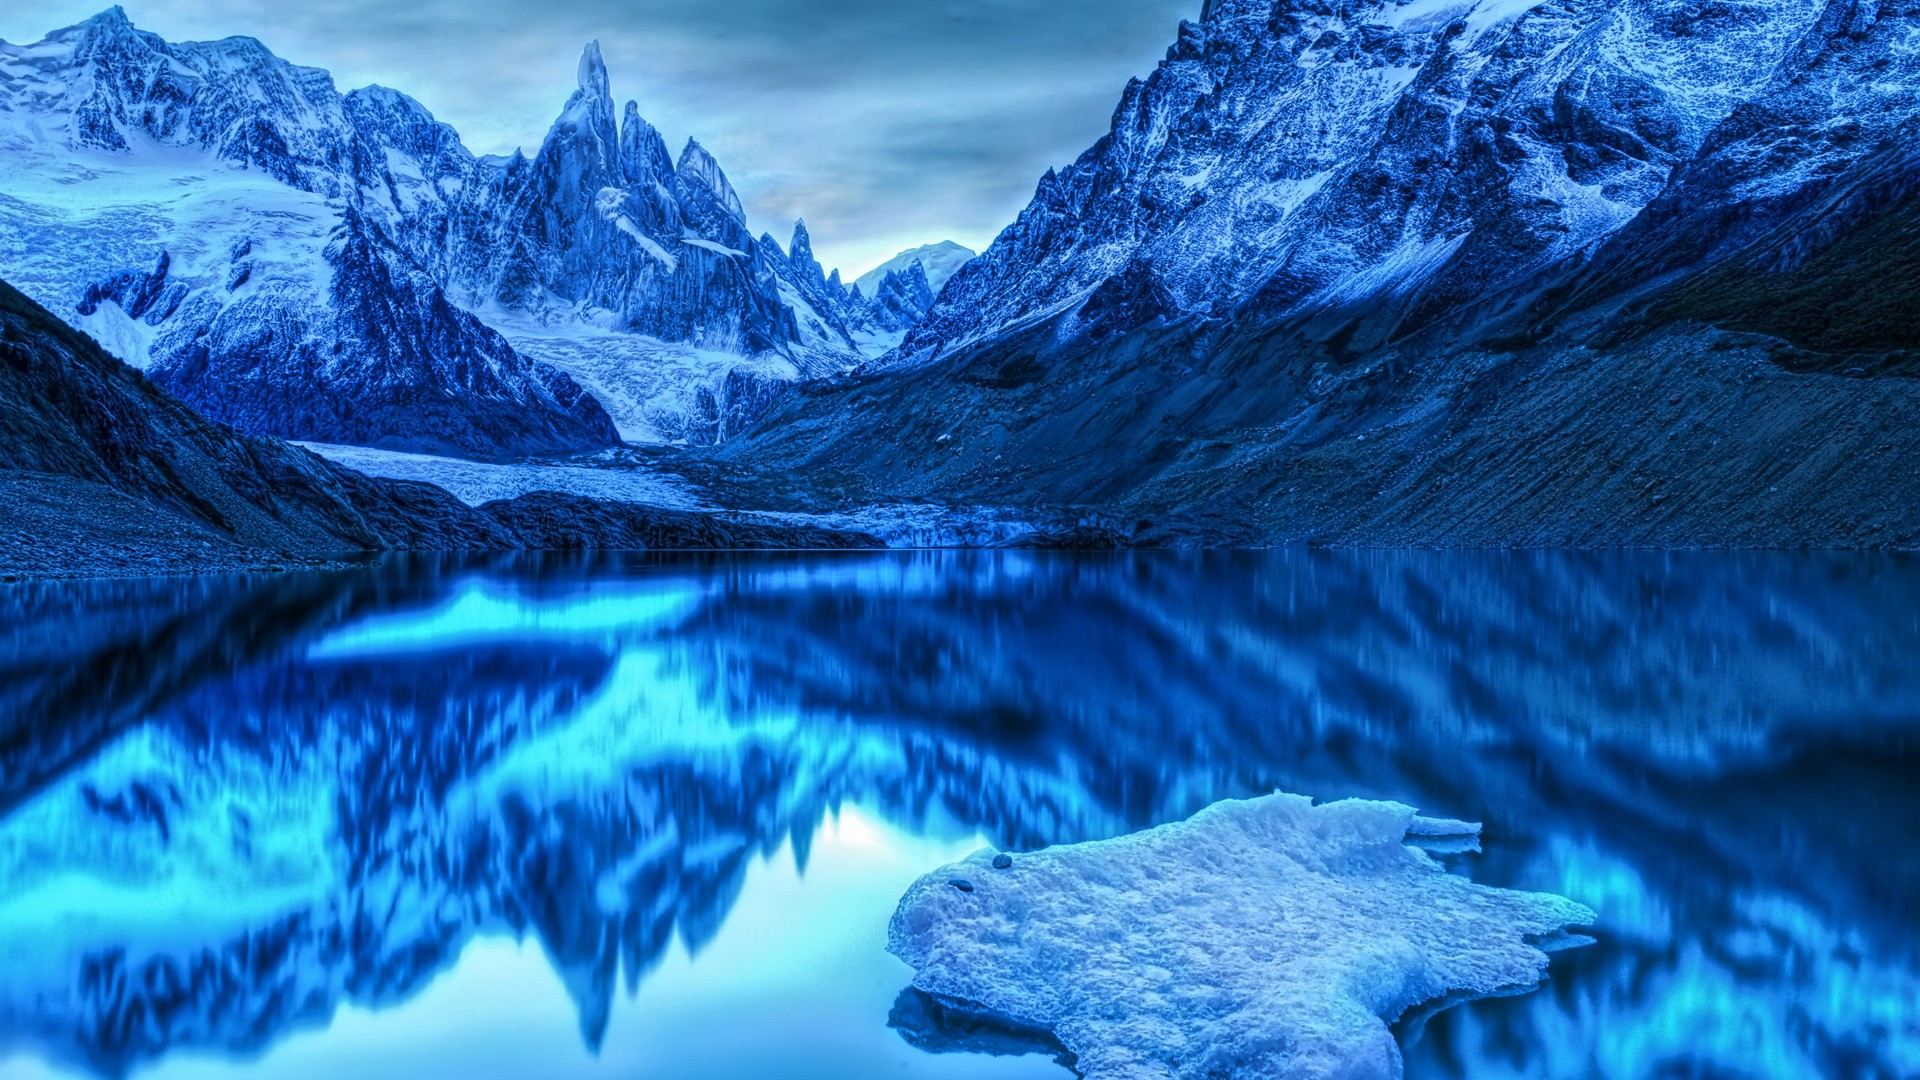 Alaska Desktop Wallpapers HD Blue Background 1920x1080